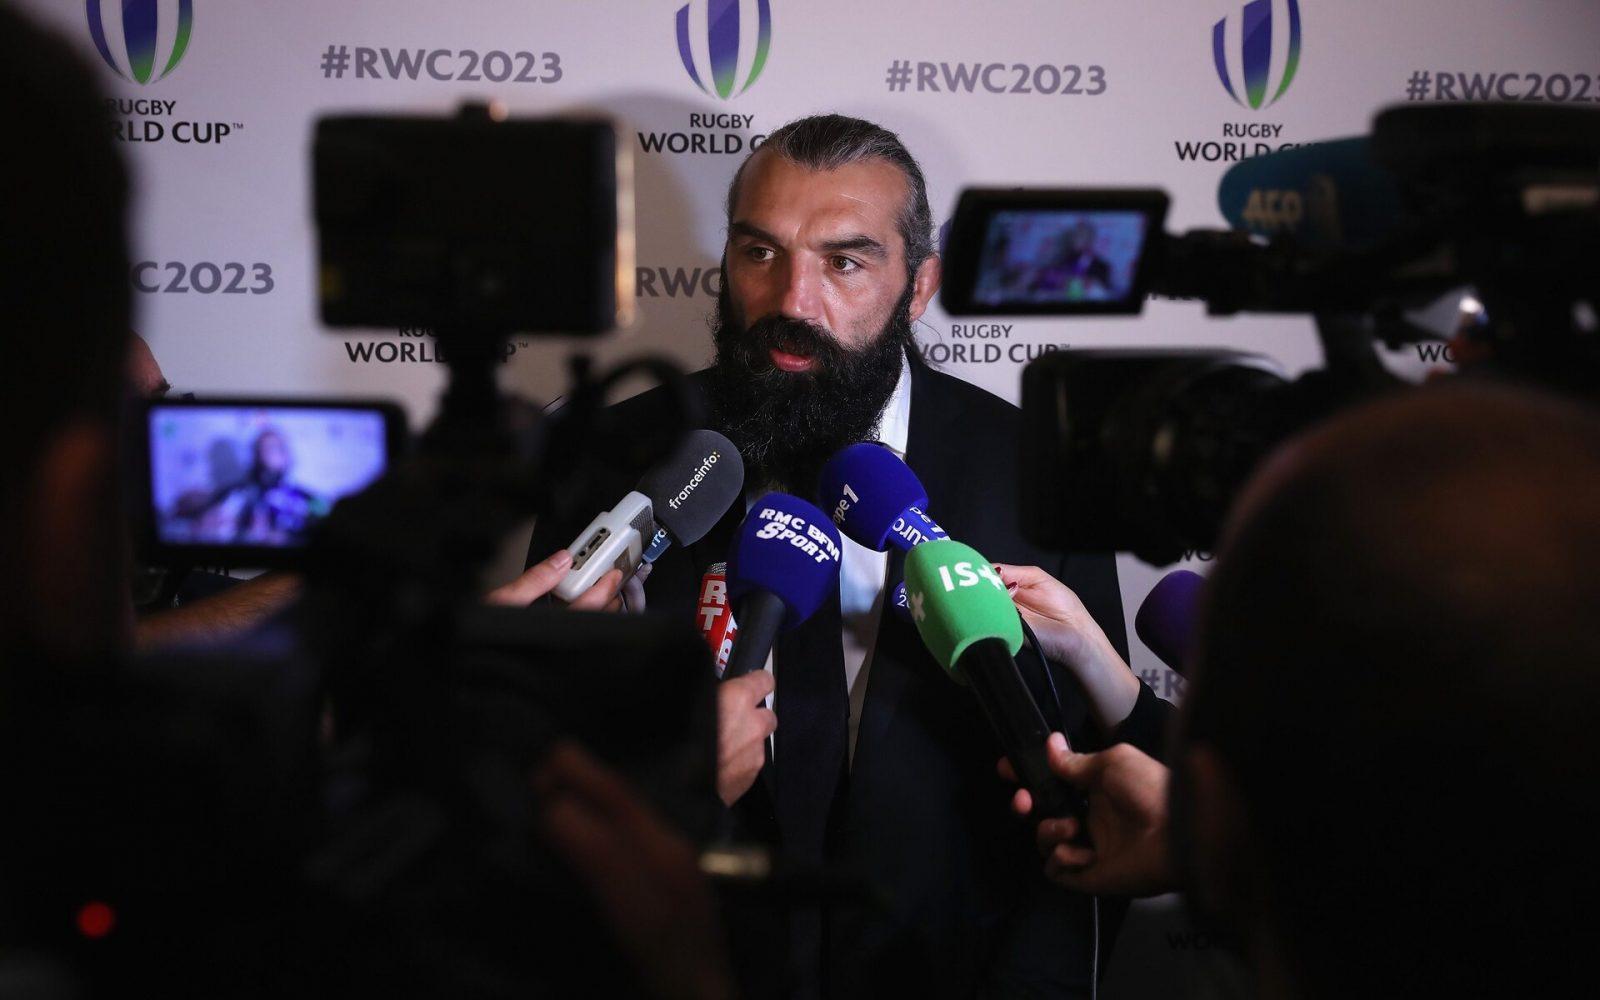 Interview de Sébastien Chabal (Rugby)